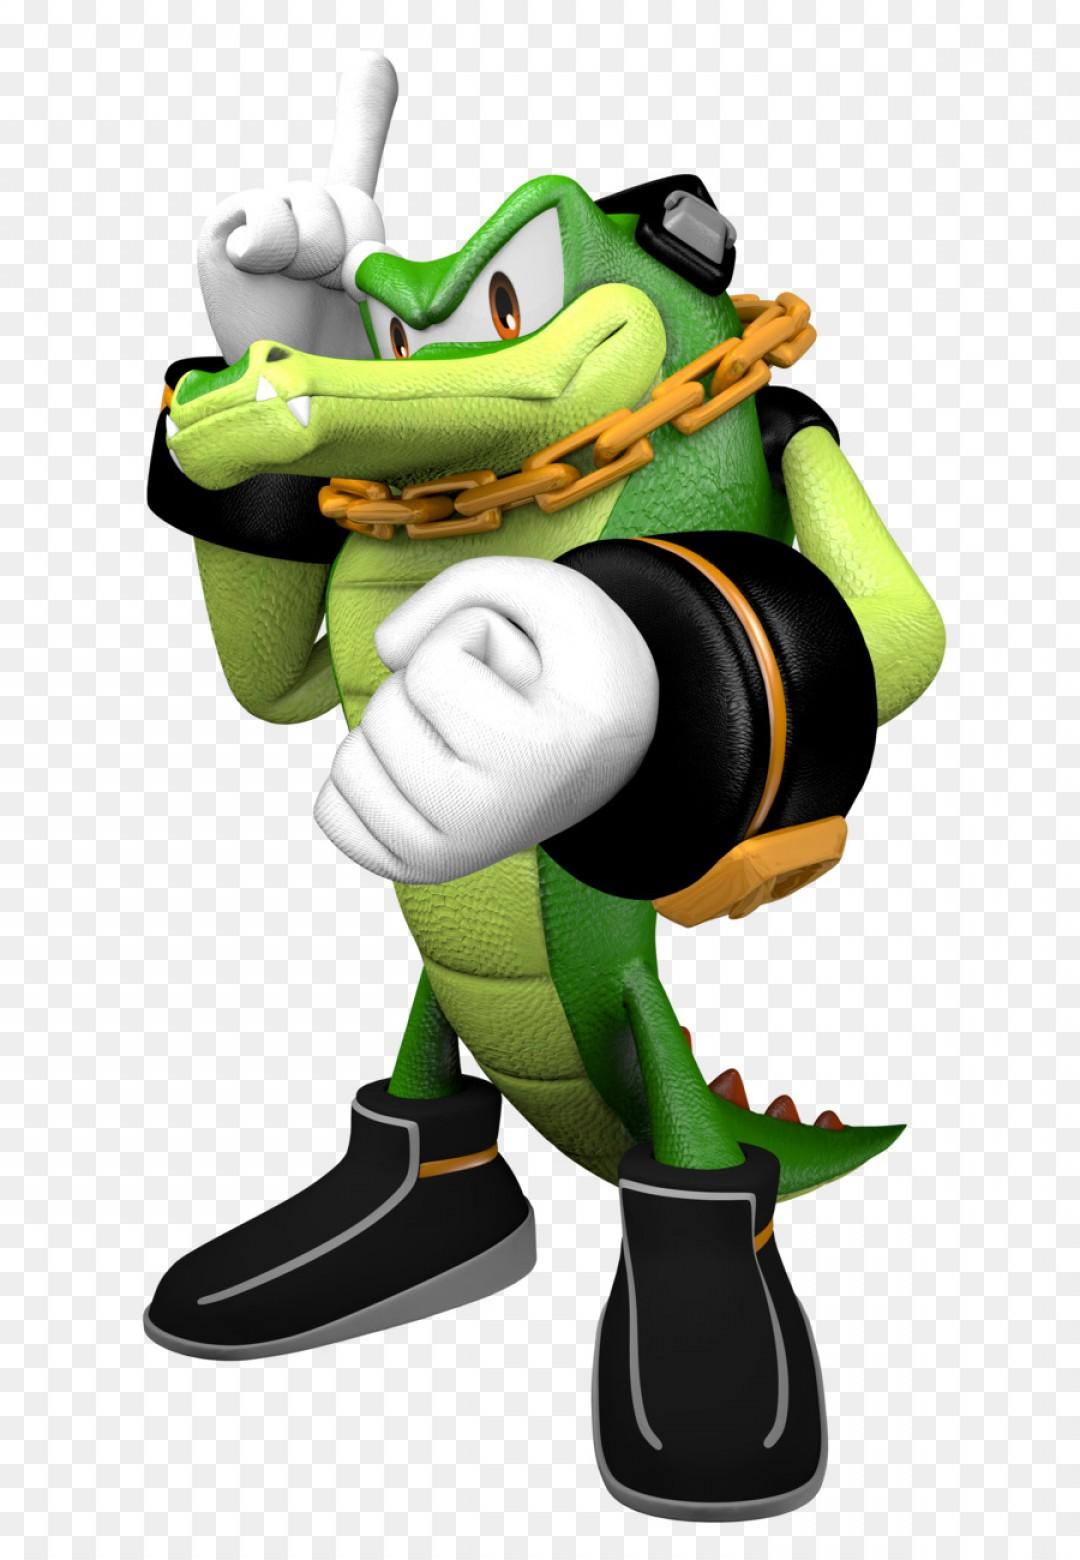 1080x1560 Png Vector The Crocodile Espio The Chameleon Sonic The Lazttweet